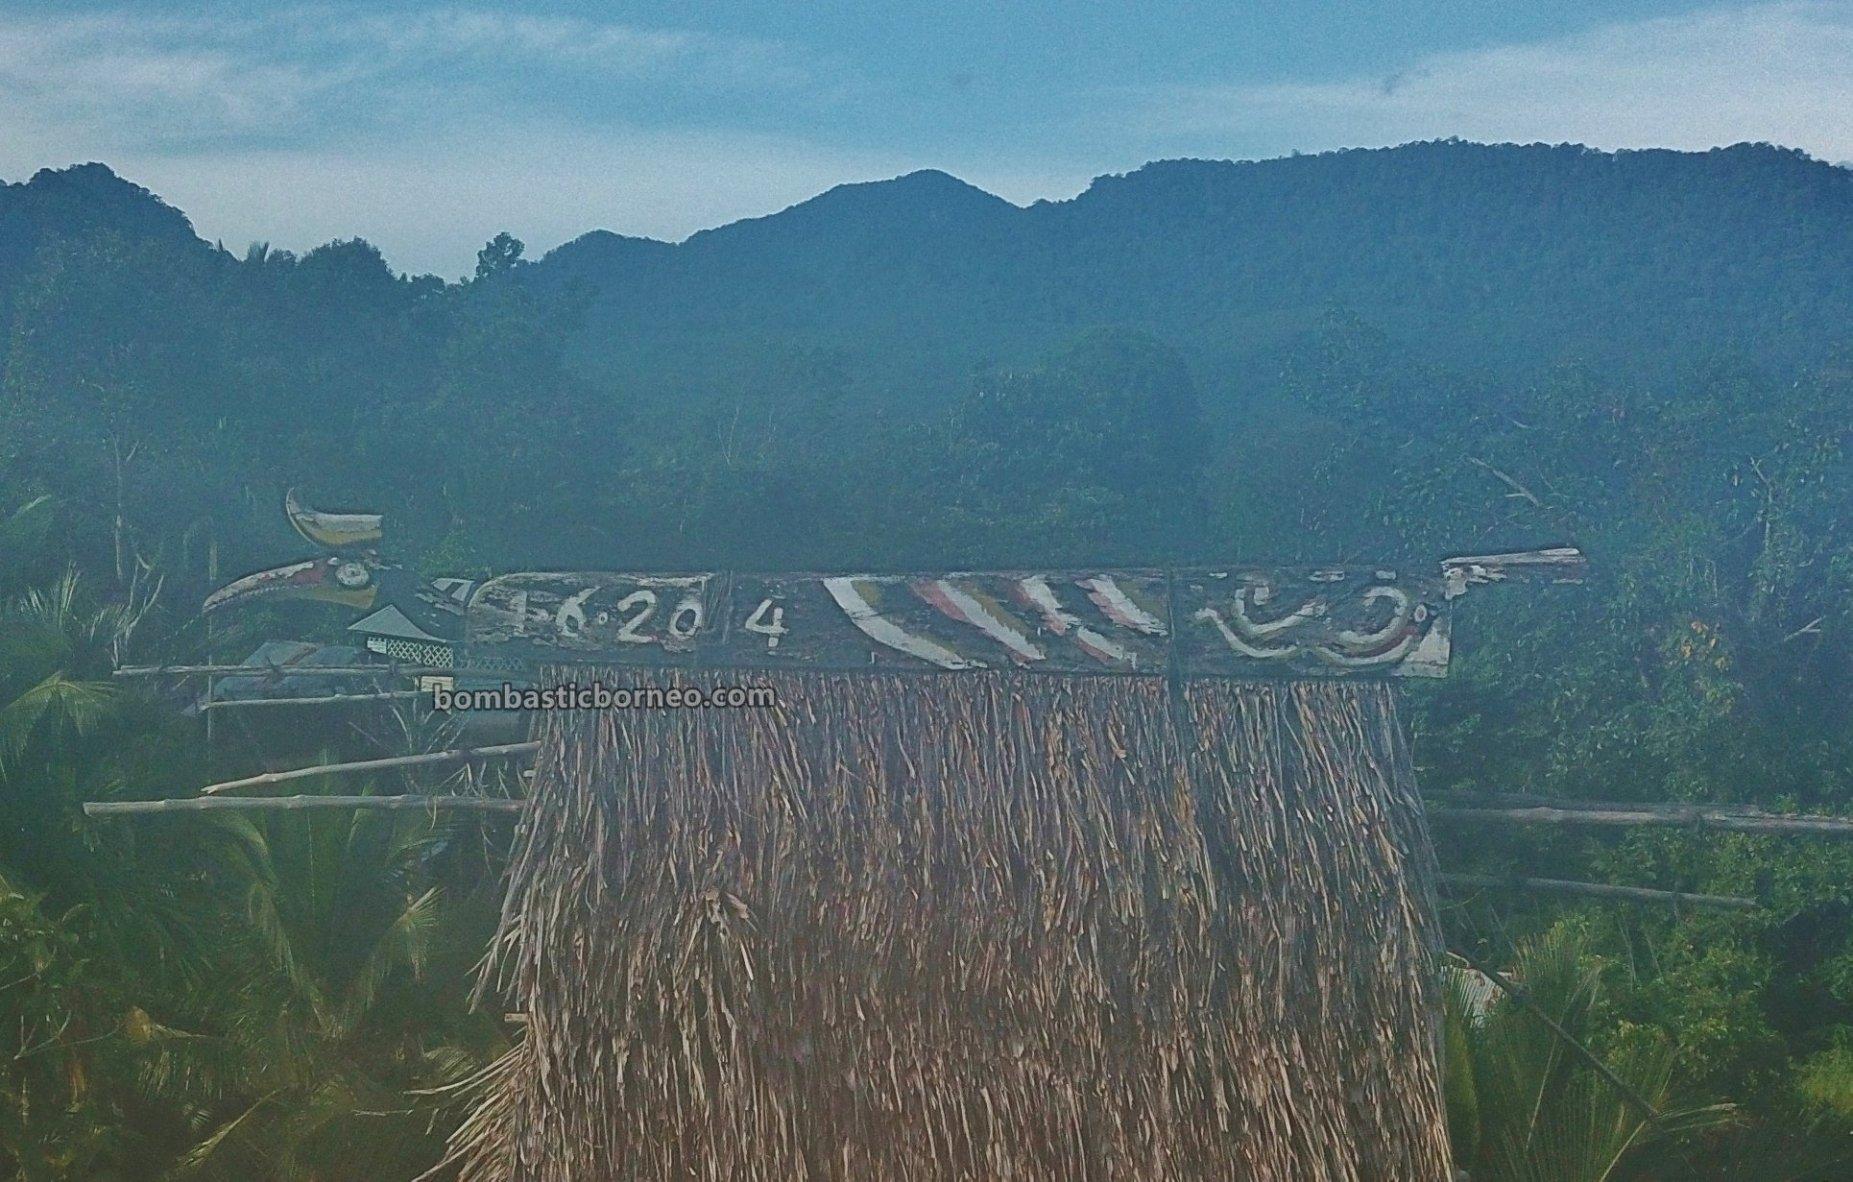 authentic, traditional, culture, Indonesia, Bengkayang, Siding, native, Dayak Bidayuh, tribal, travel guide, Borneo, Baruk, 探索婆罗洲游踪, 印尼原住民骷髅屋, 西加里曼丹孟加映